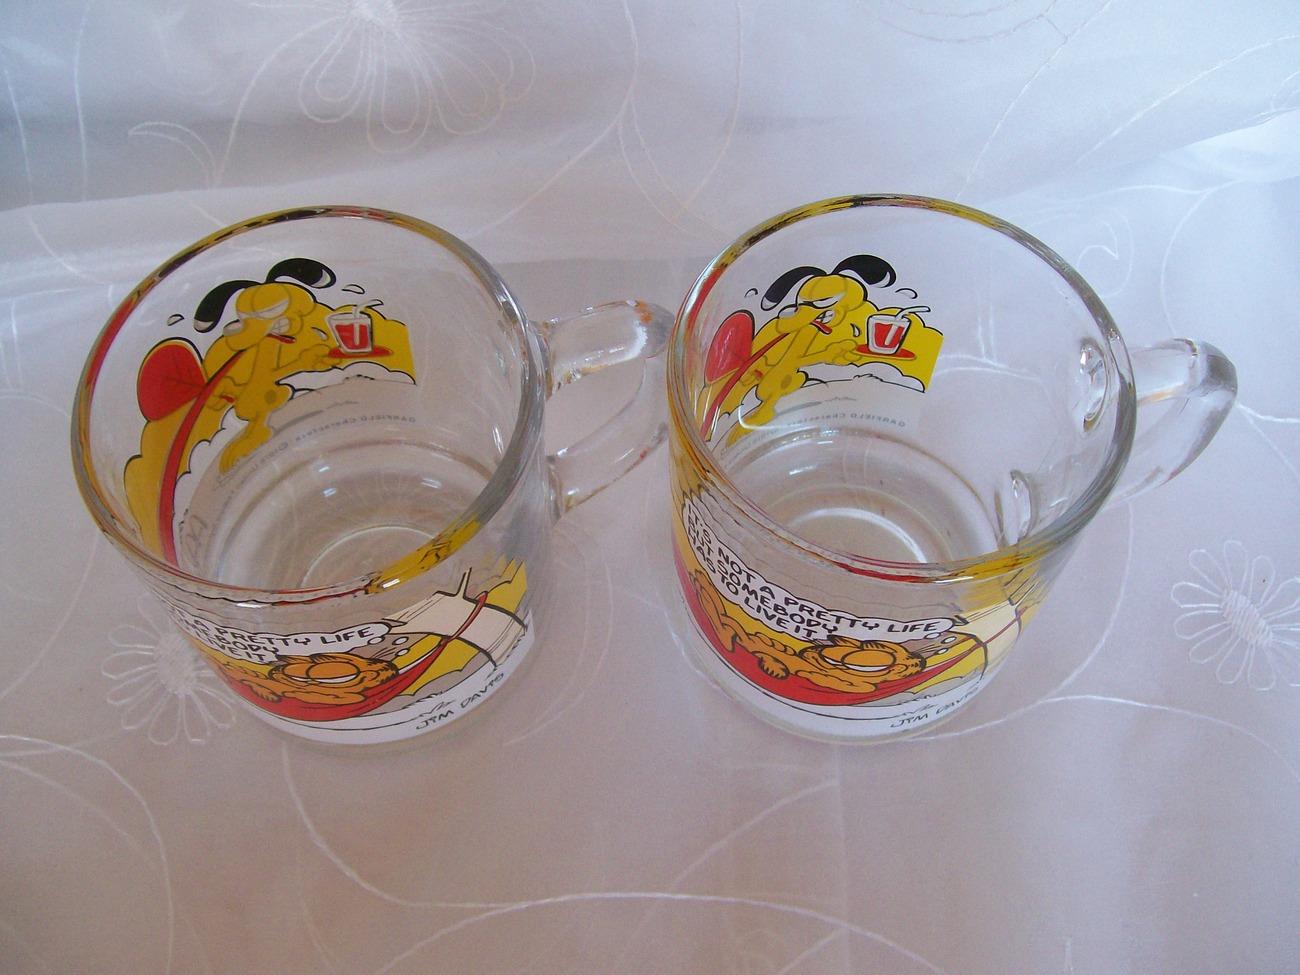 1978 McDonalds- Garfield Collectible Coffee Mug/Cup -Jim Davis– Lot 2